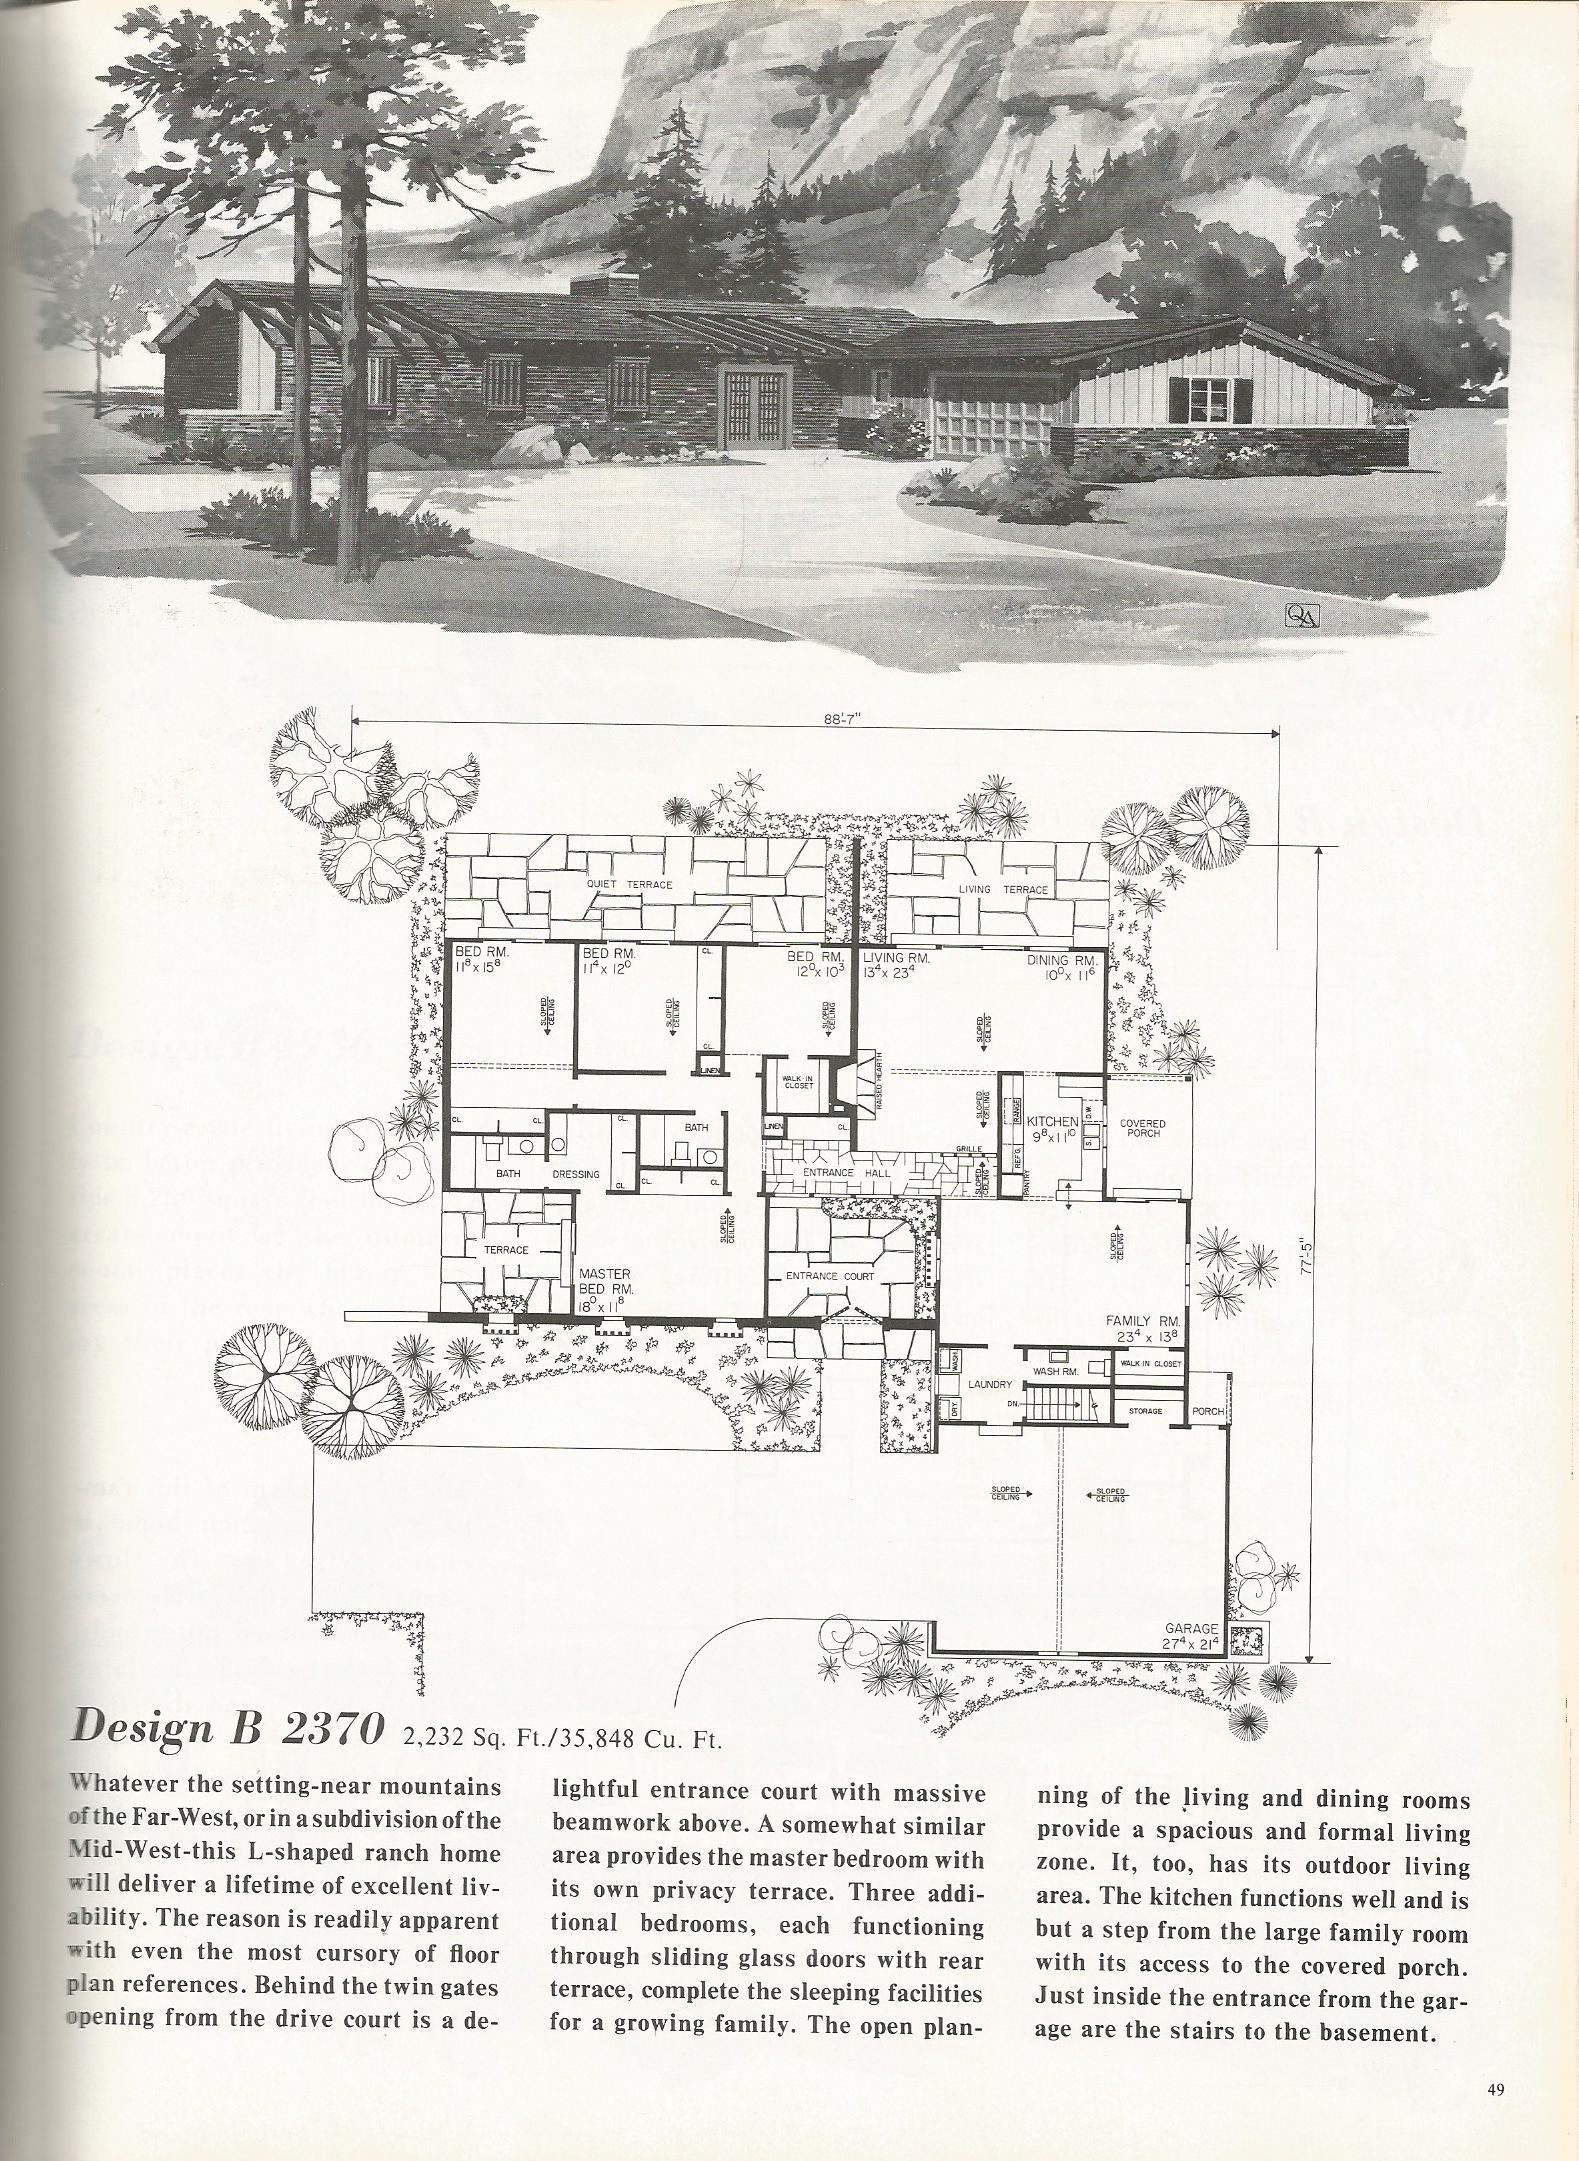 Vintage House Plans 2370 Antique Alter Ego